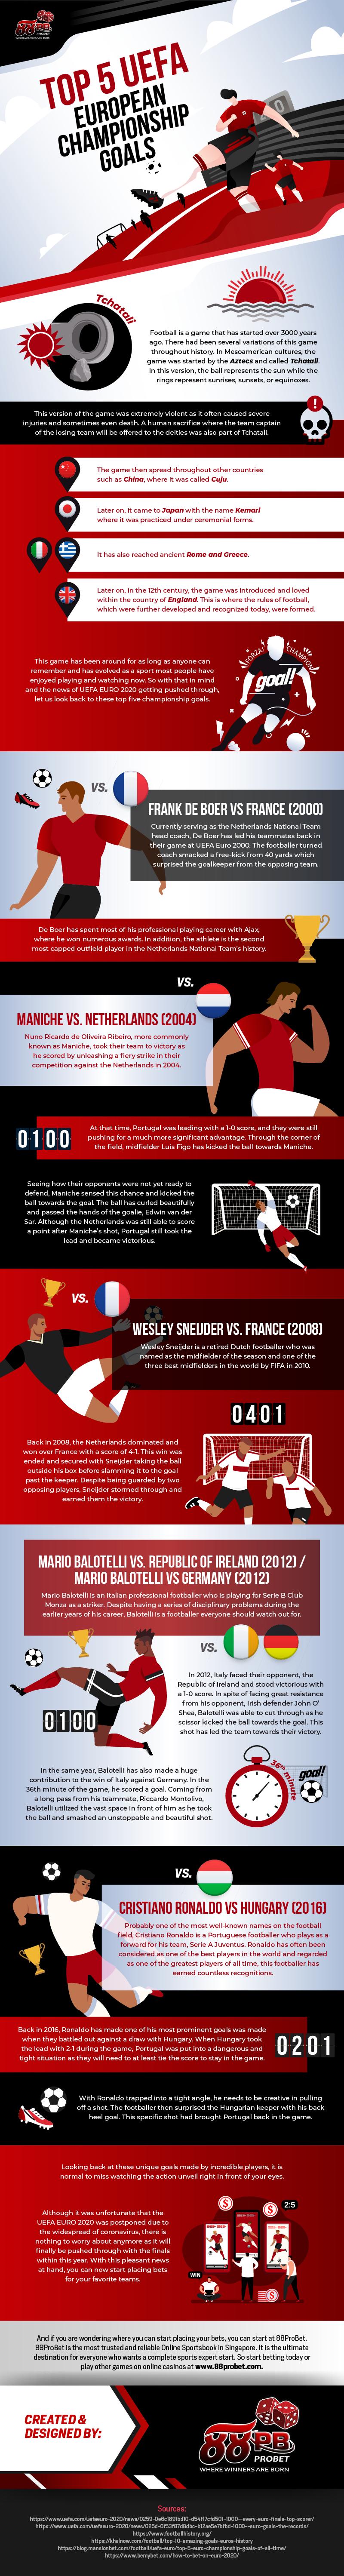 Top-5-UEFA-European-Championship-Goals-Infographic